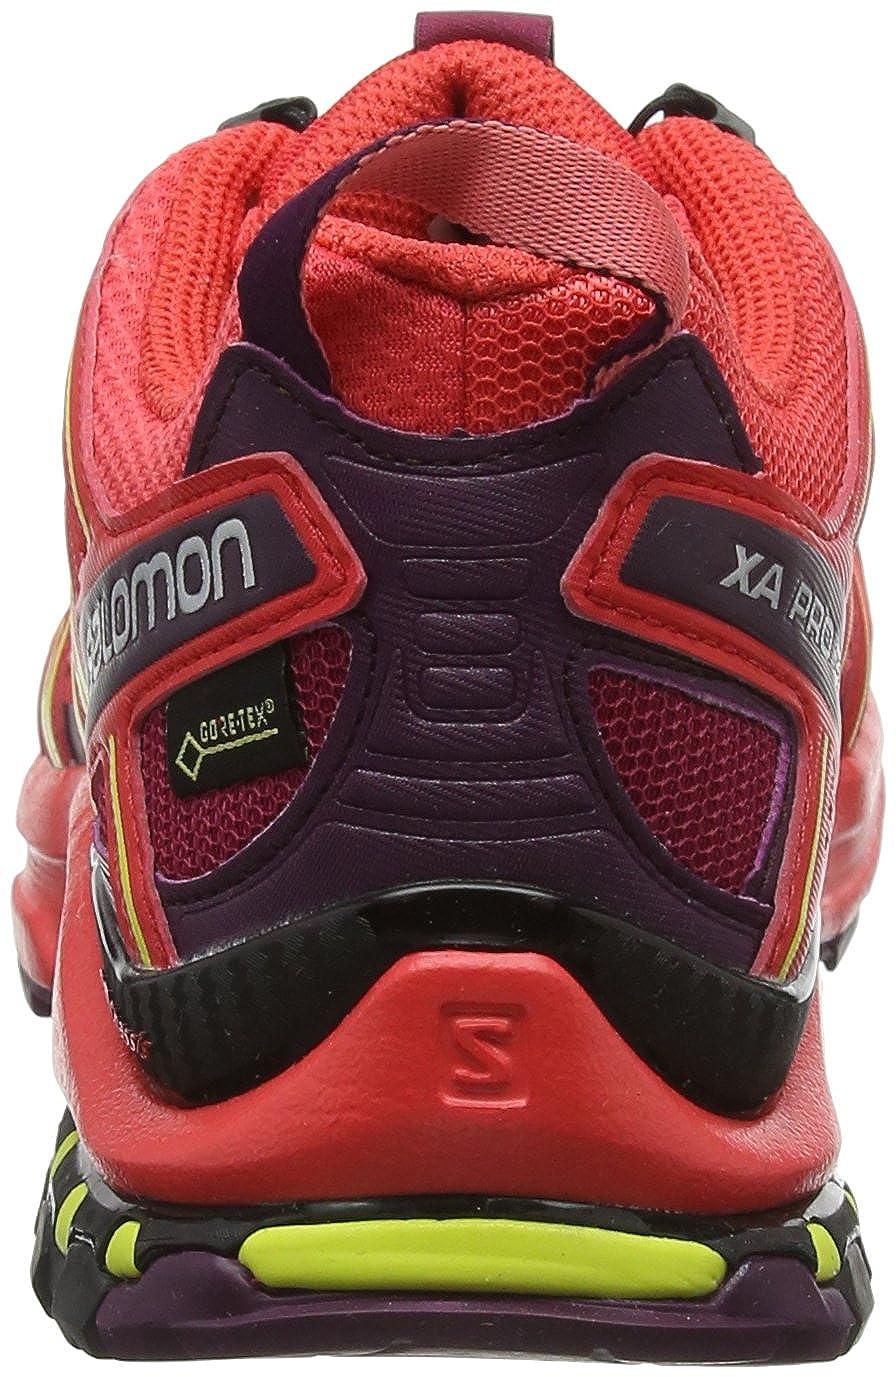 Salomon Damen Xa Pro 3D GTX GTX GTX W Traillaufschuhe  ed0ba4